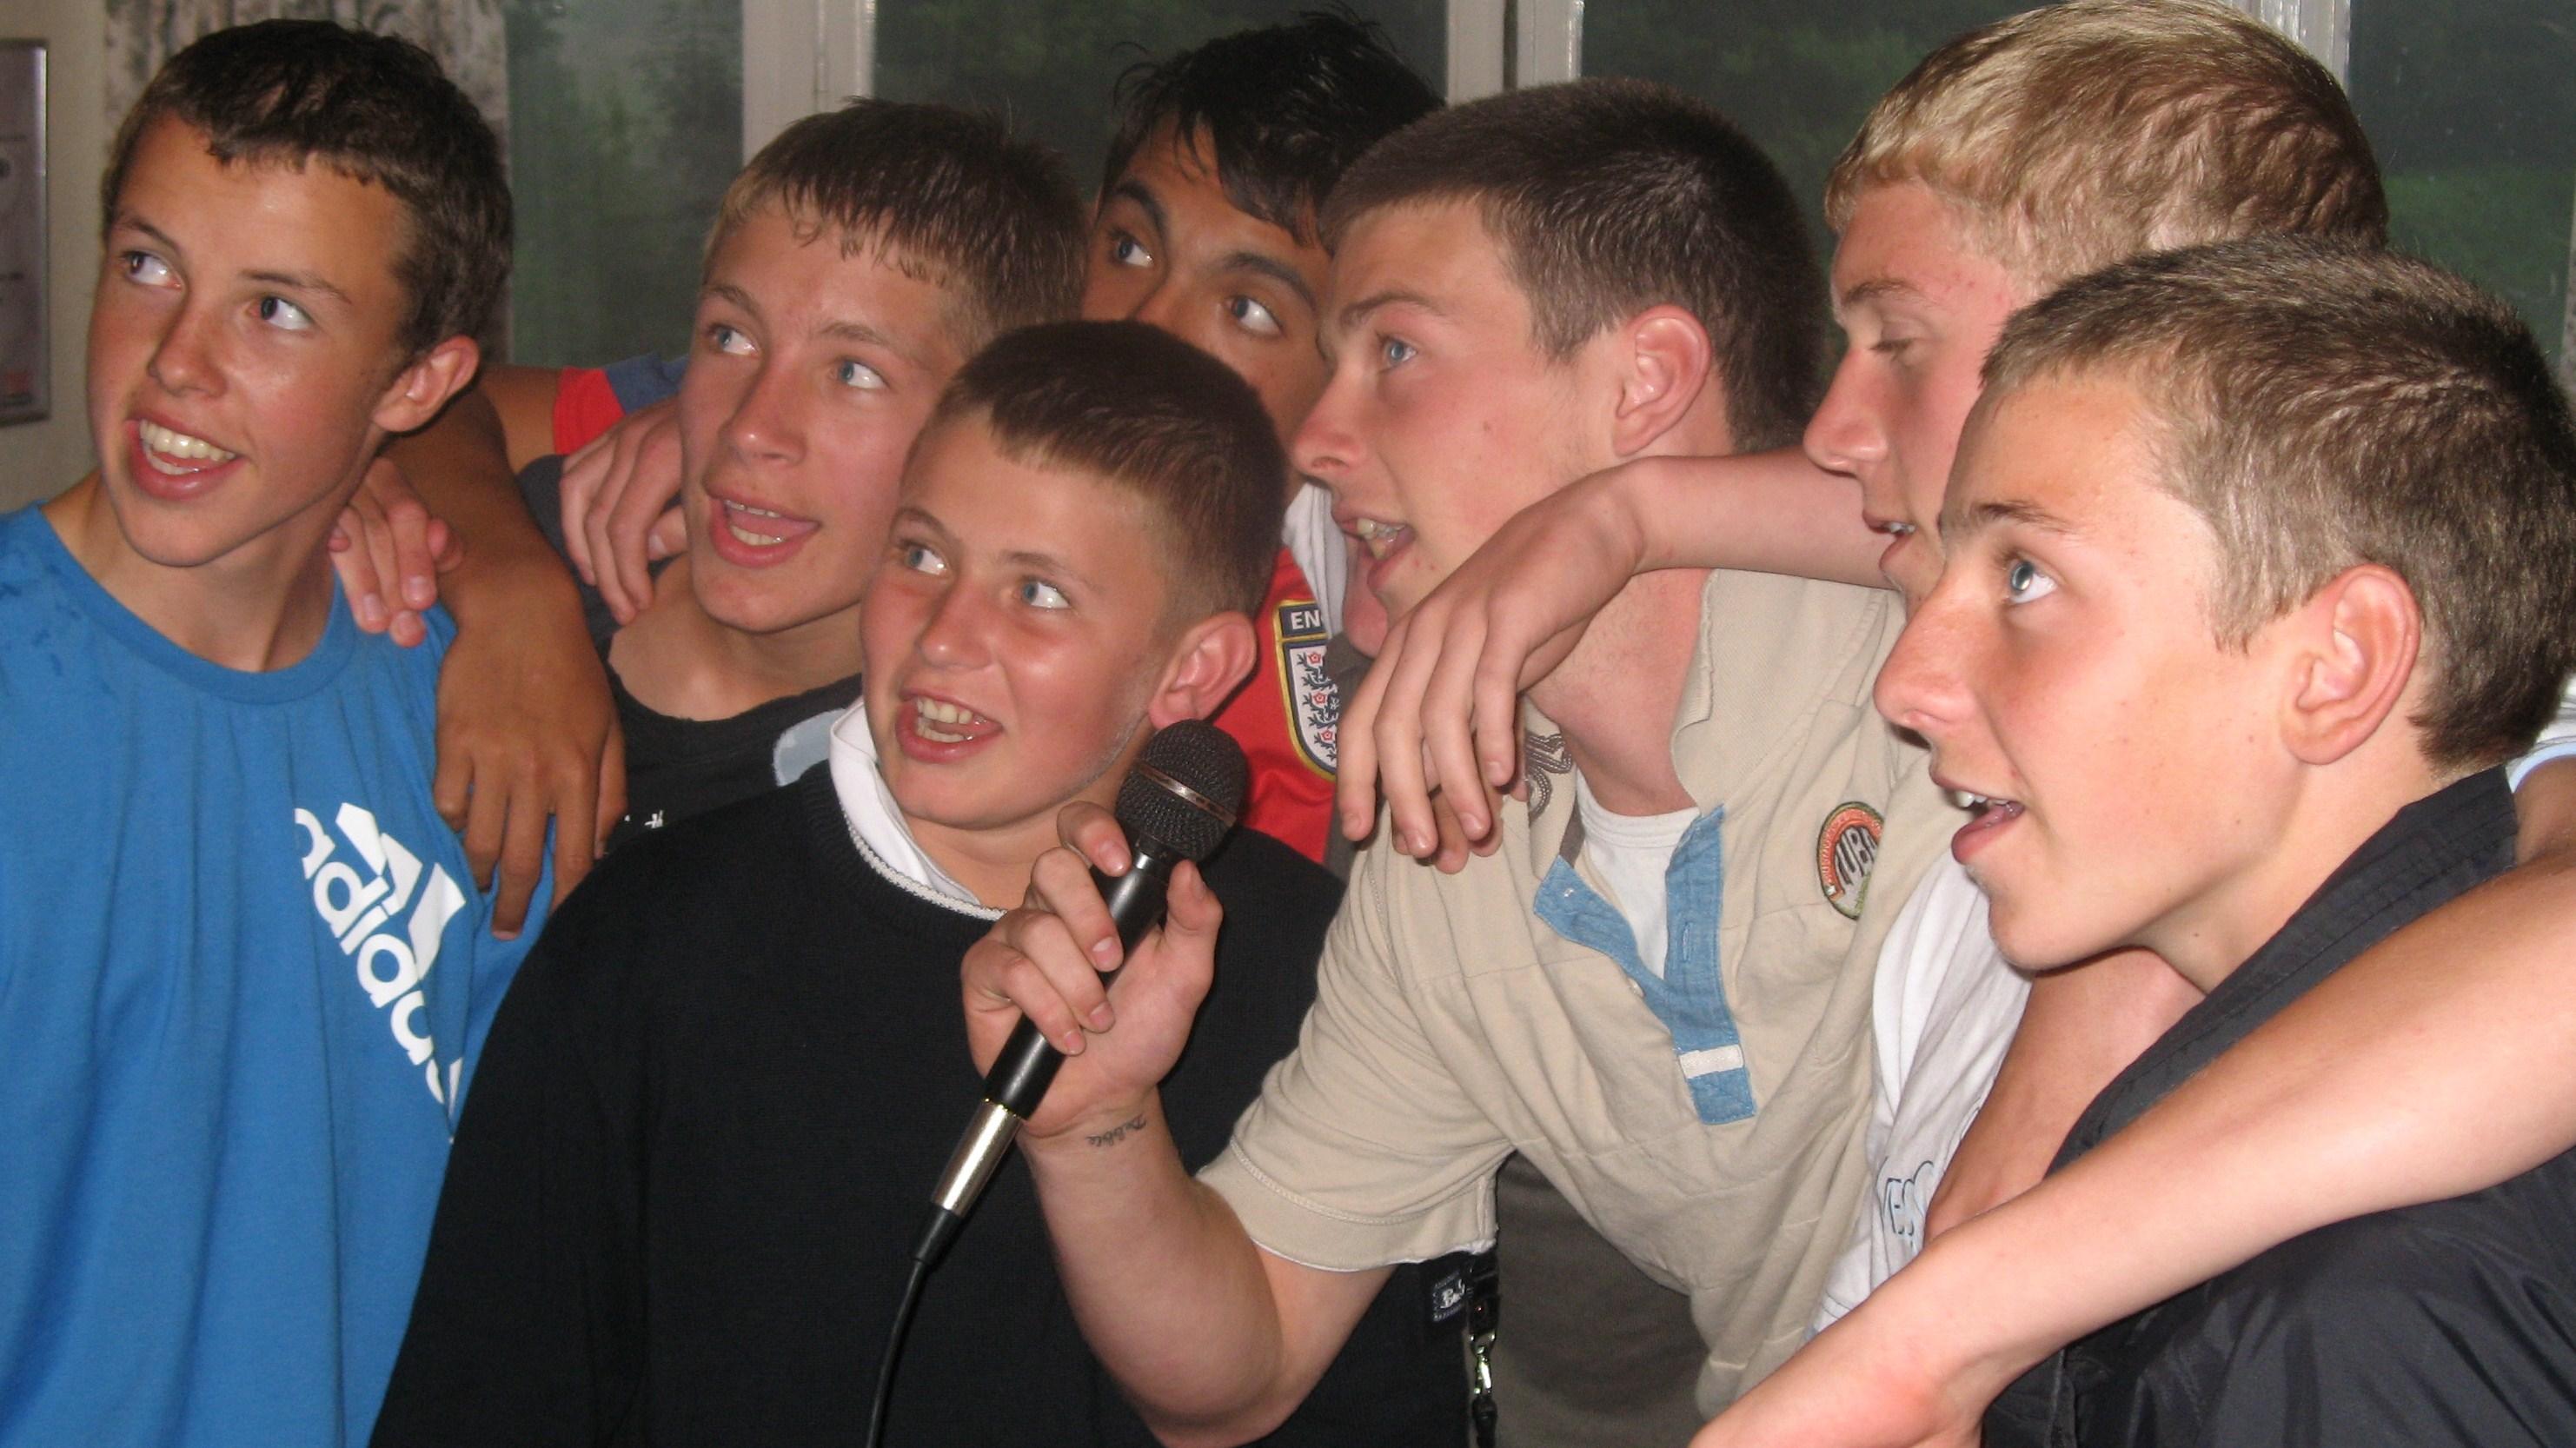 karaoke boys france